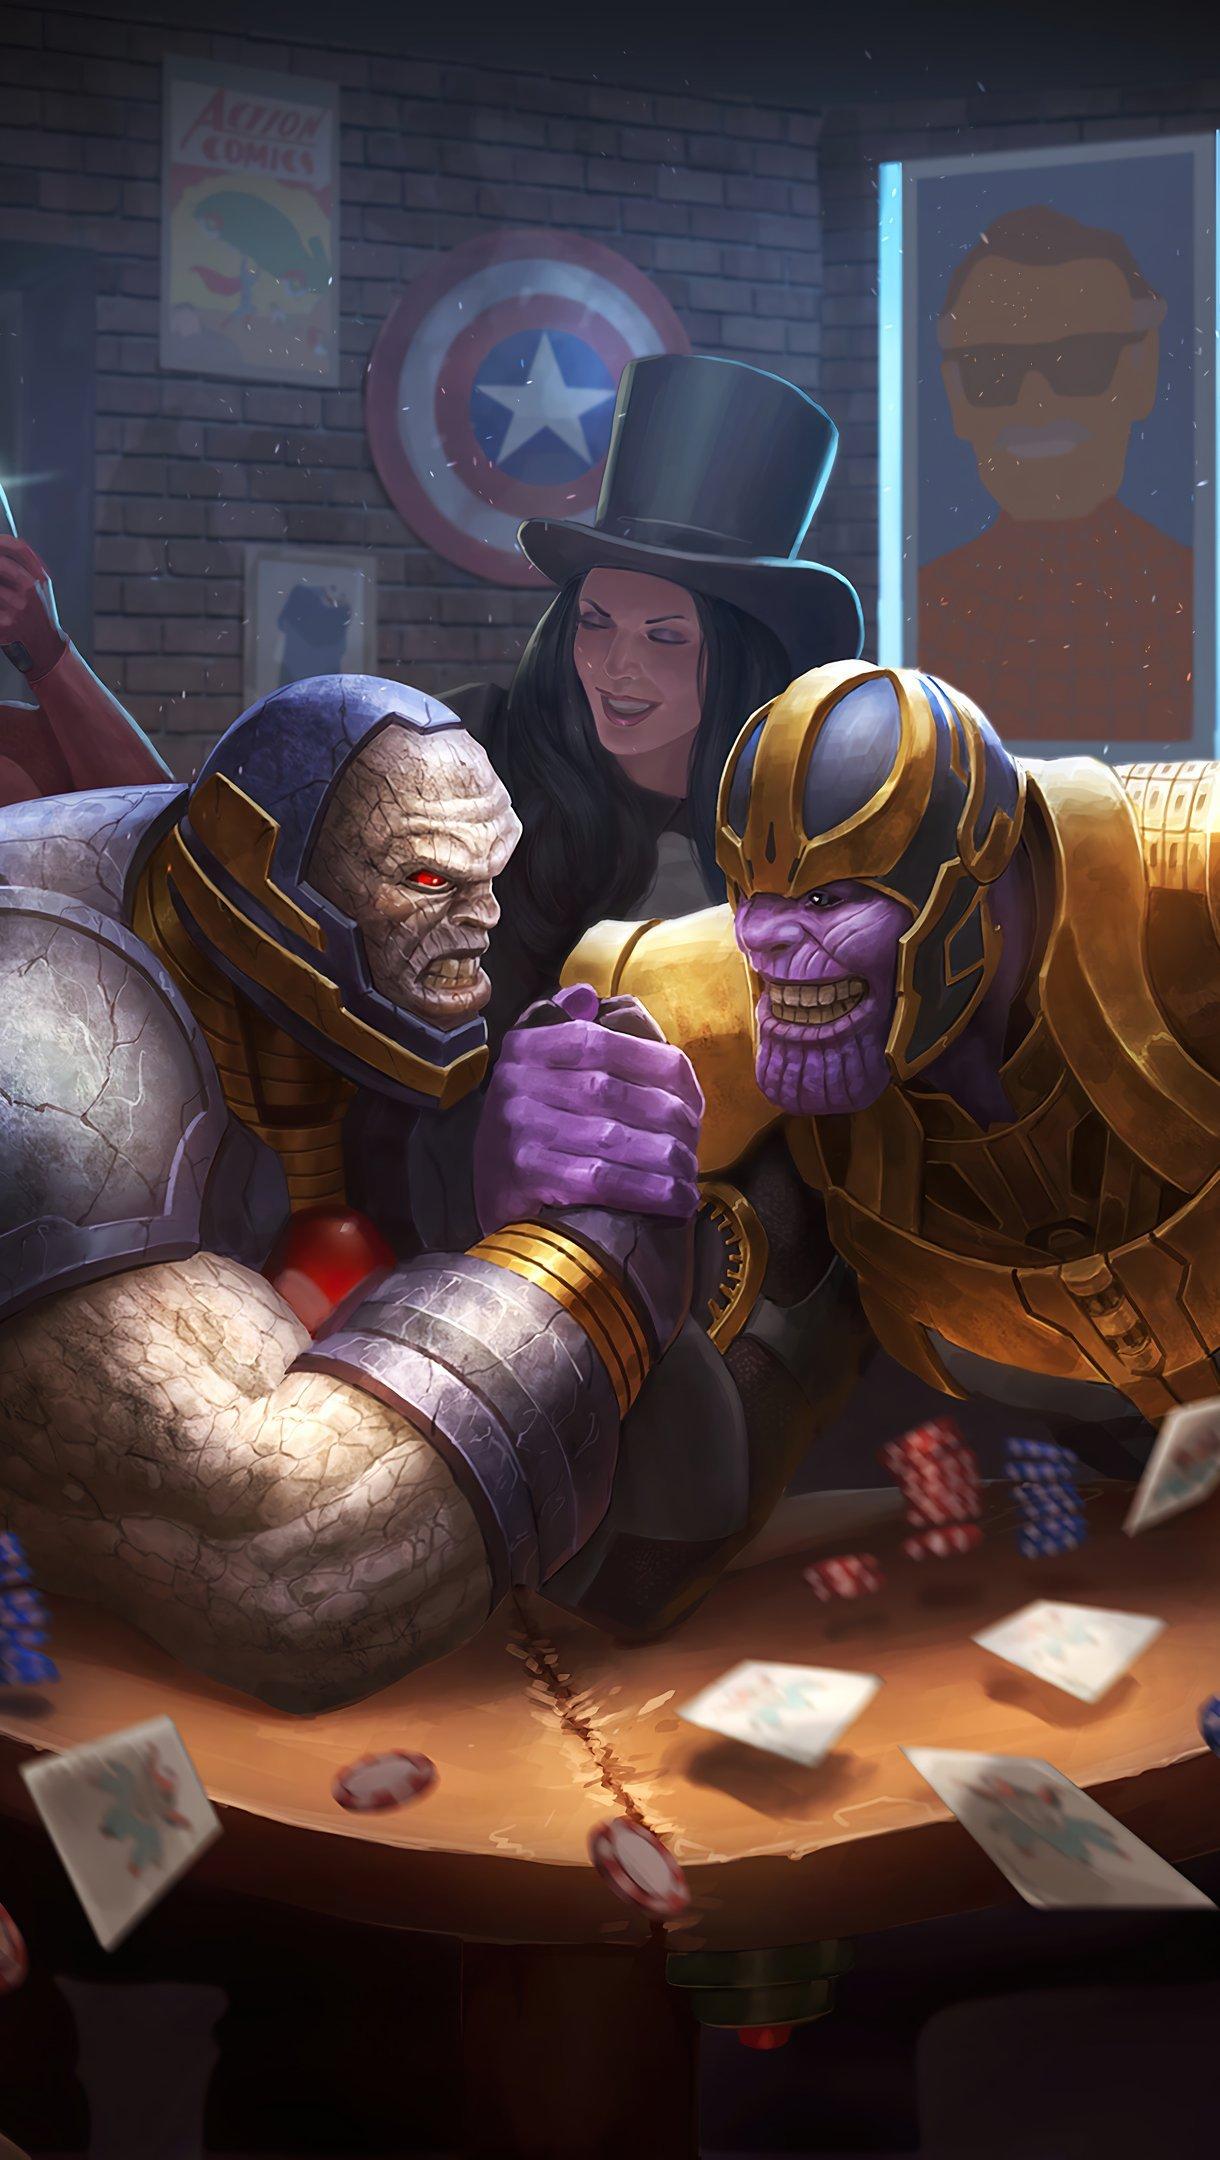 Wallpaper Darksaid vs Thanos in bar Vertical